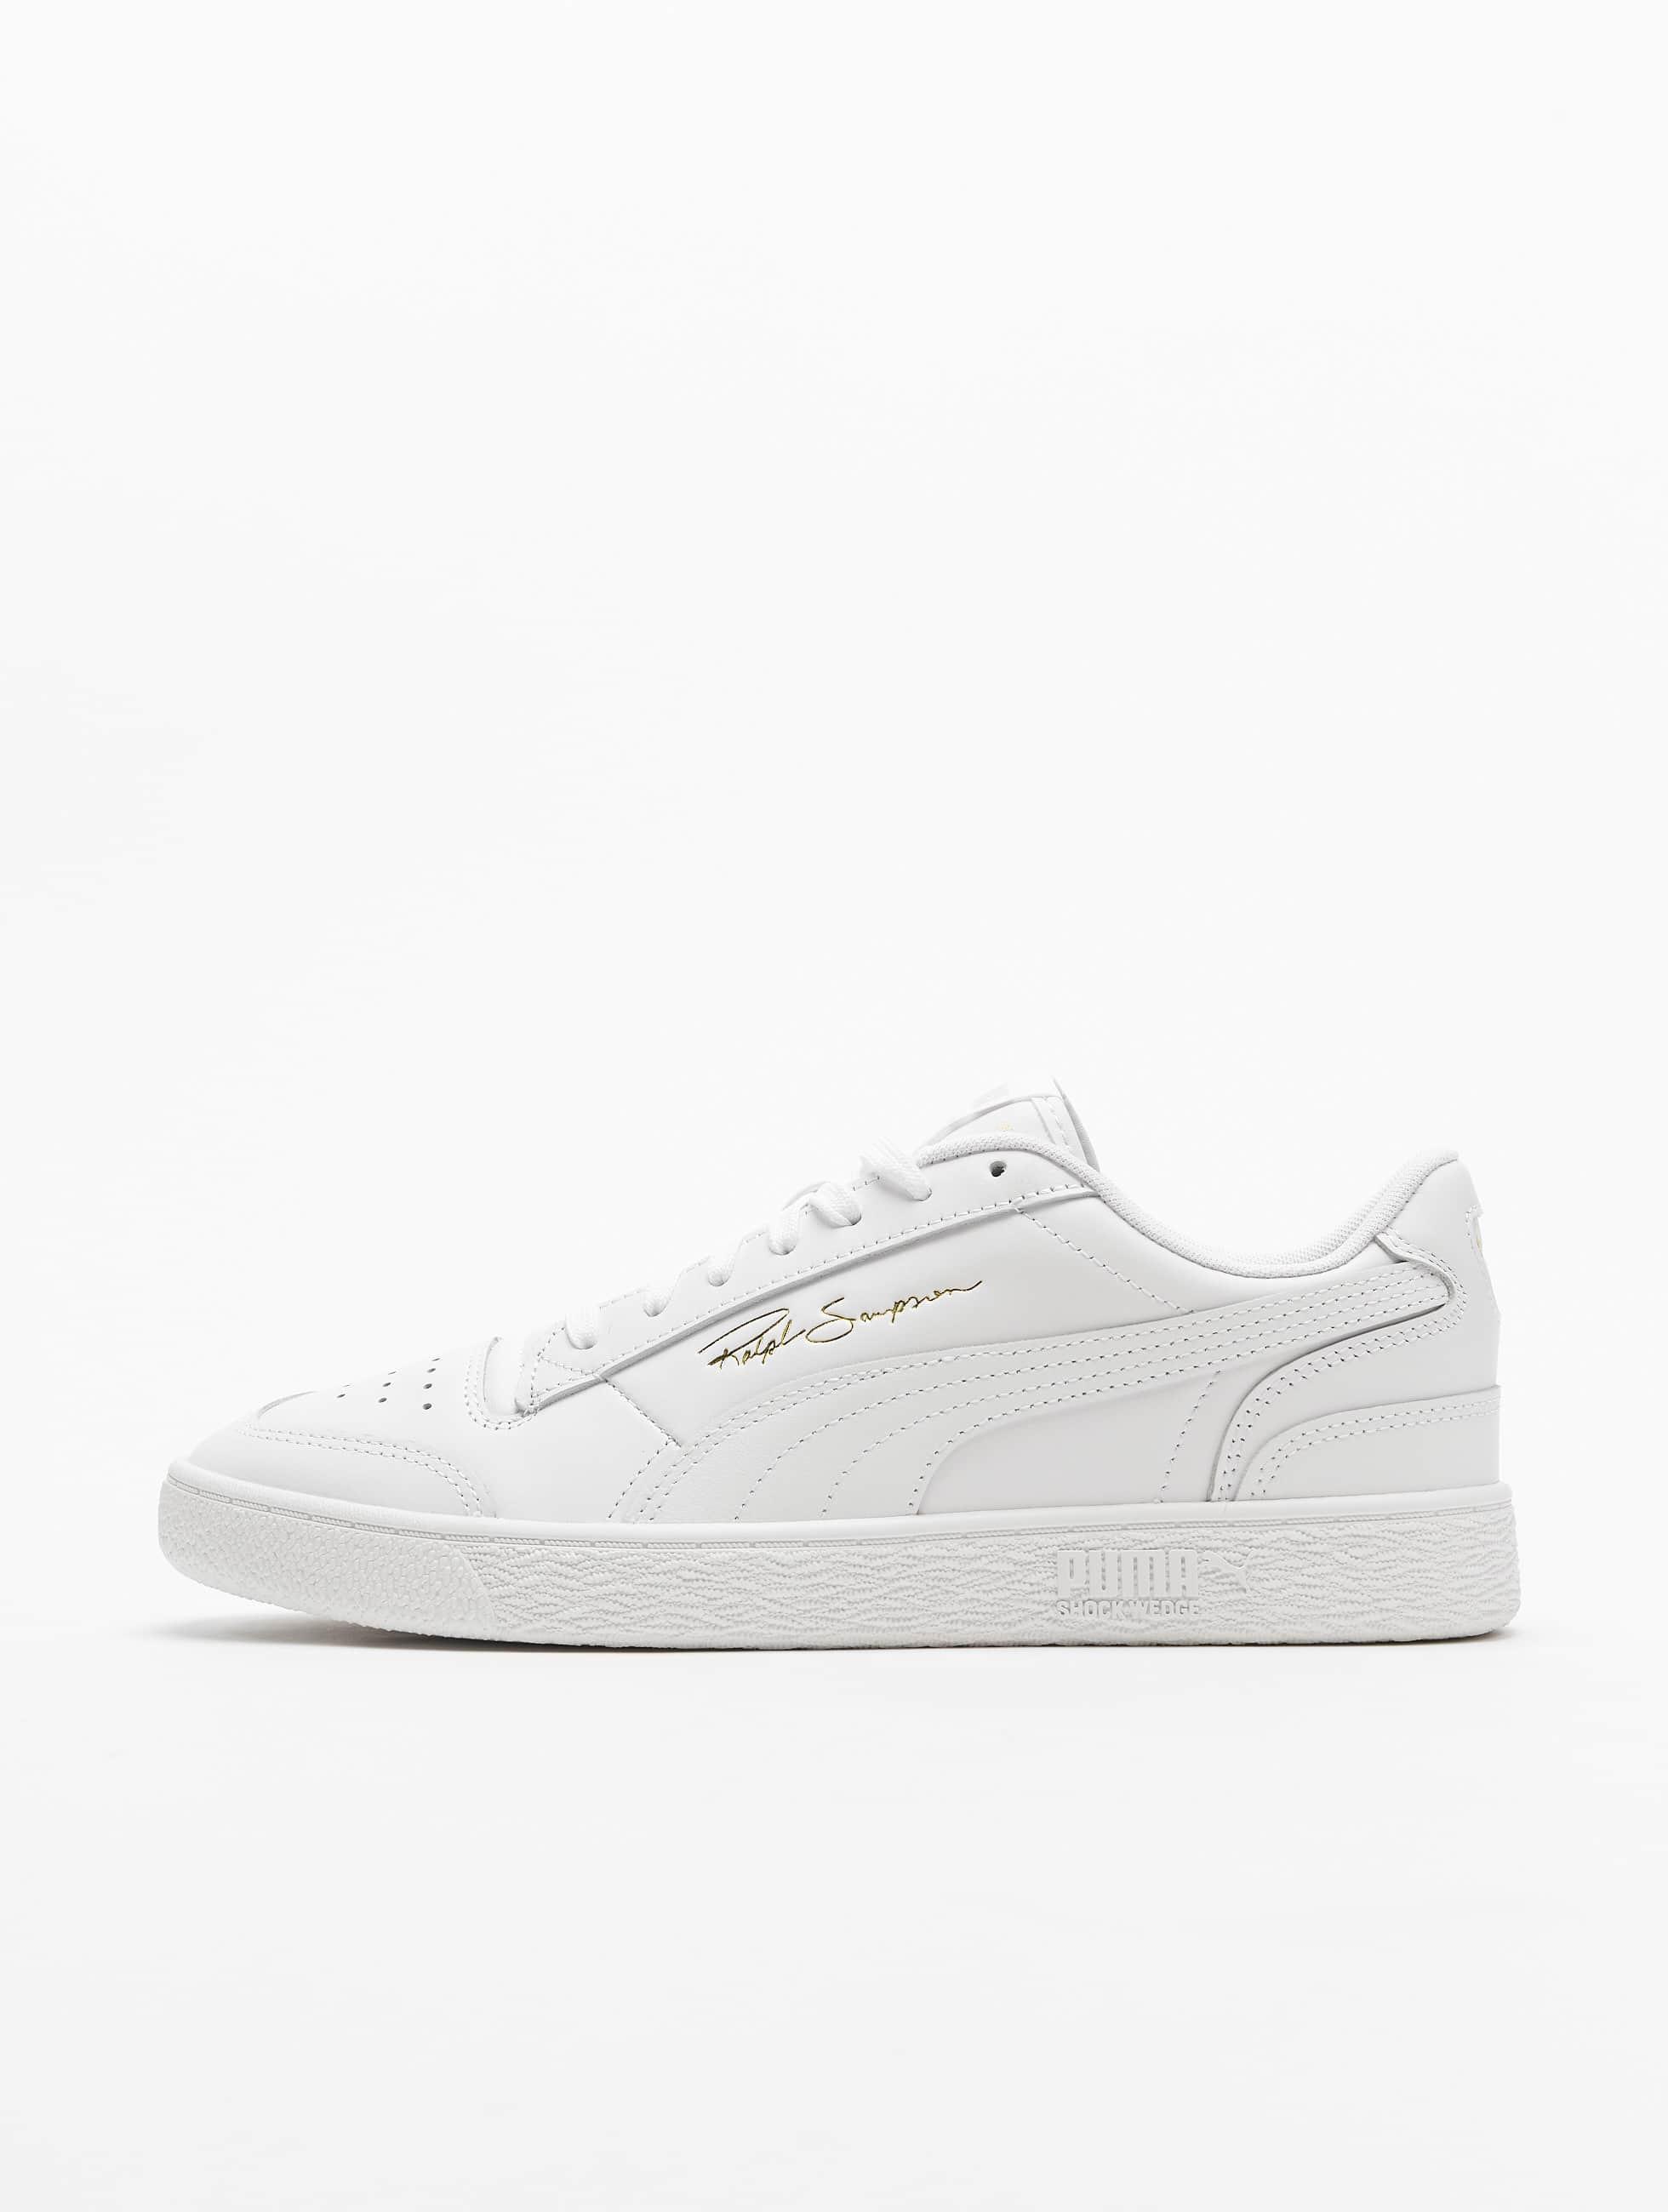 Puma Ralph Sampson Low Sneakers Puma WhitePuma WhitePuma White